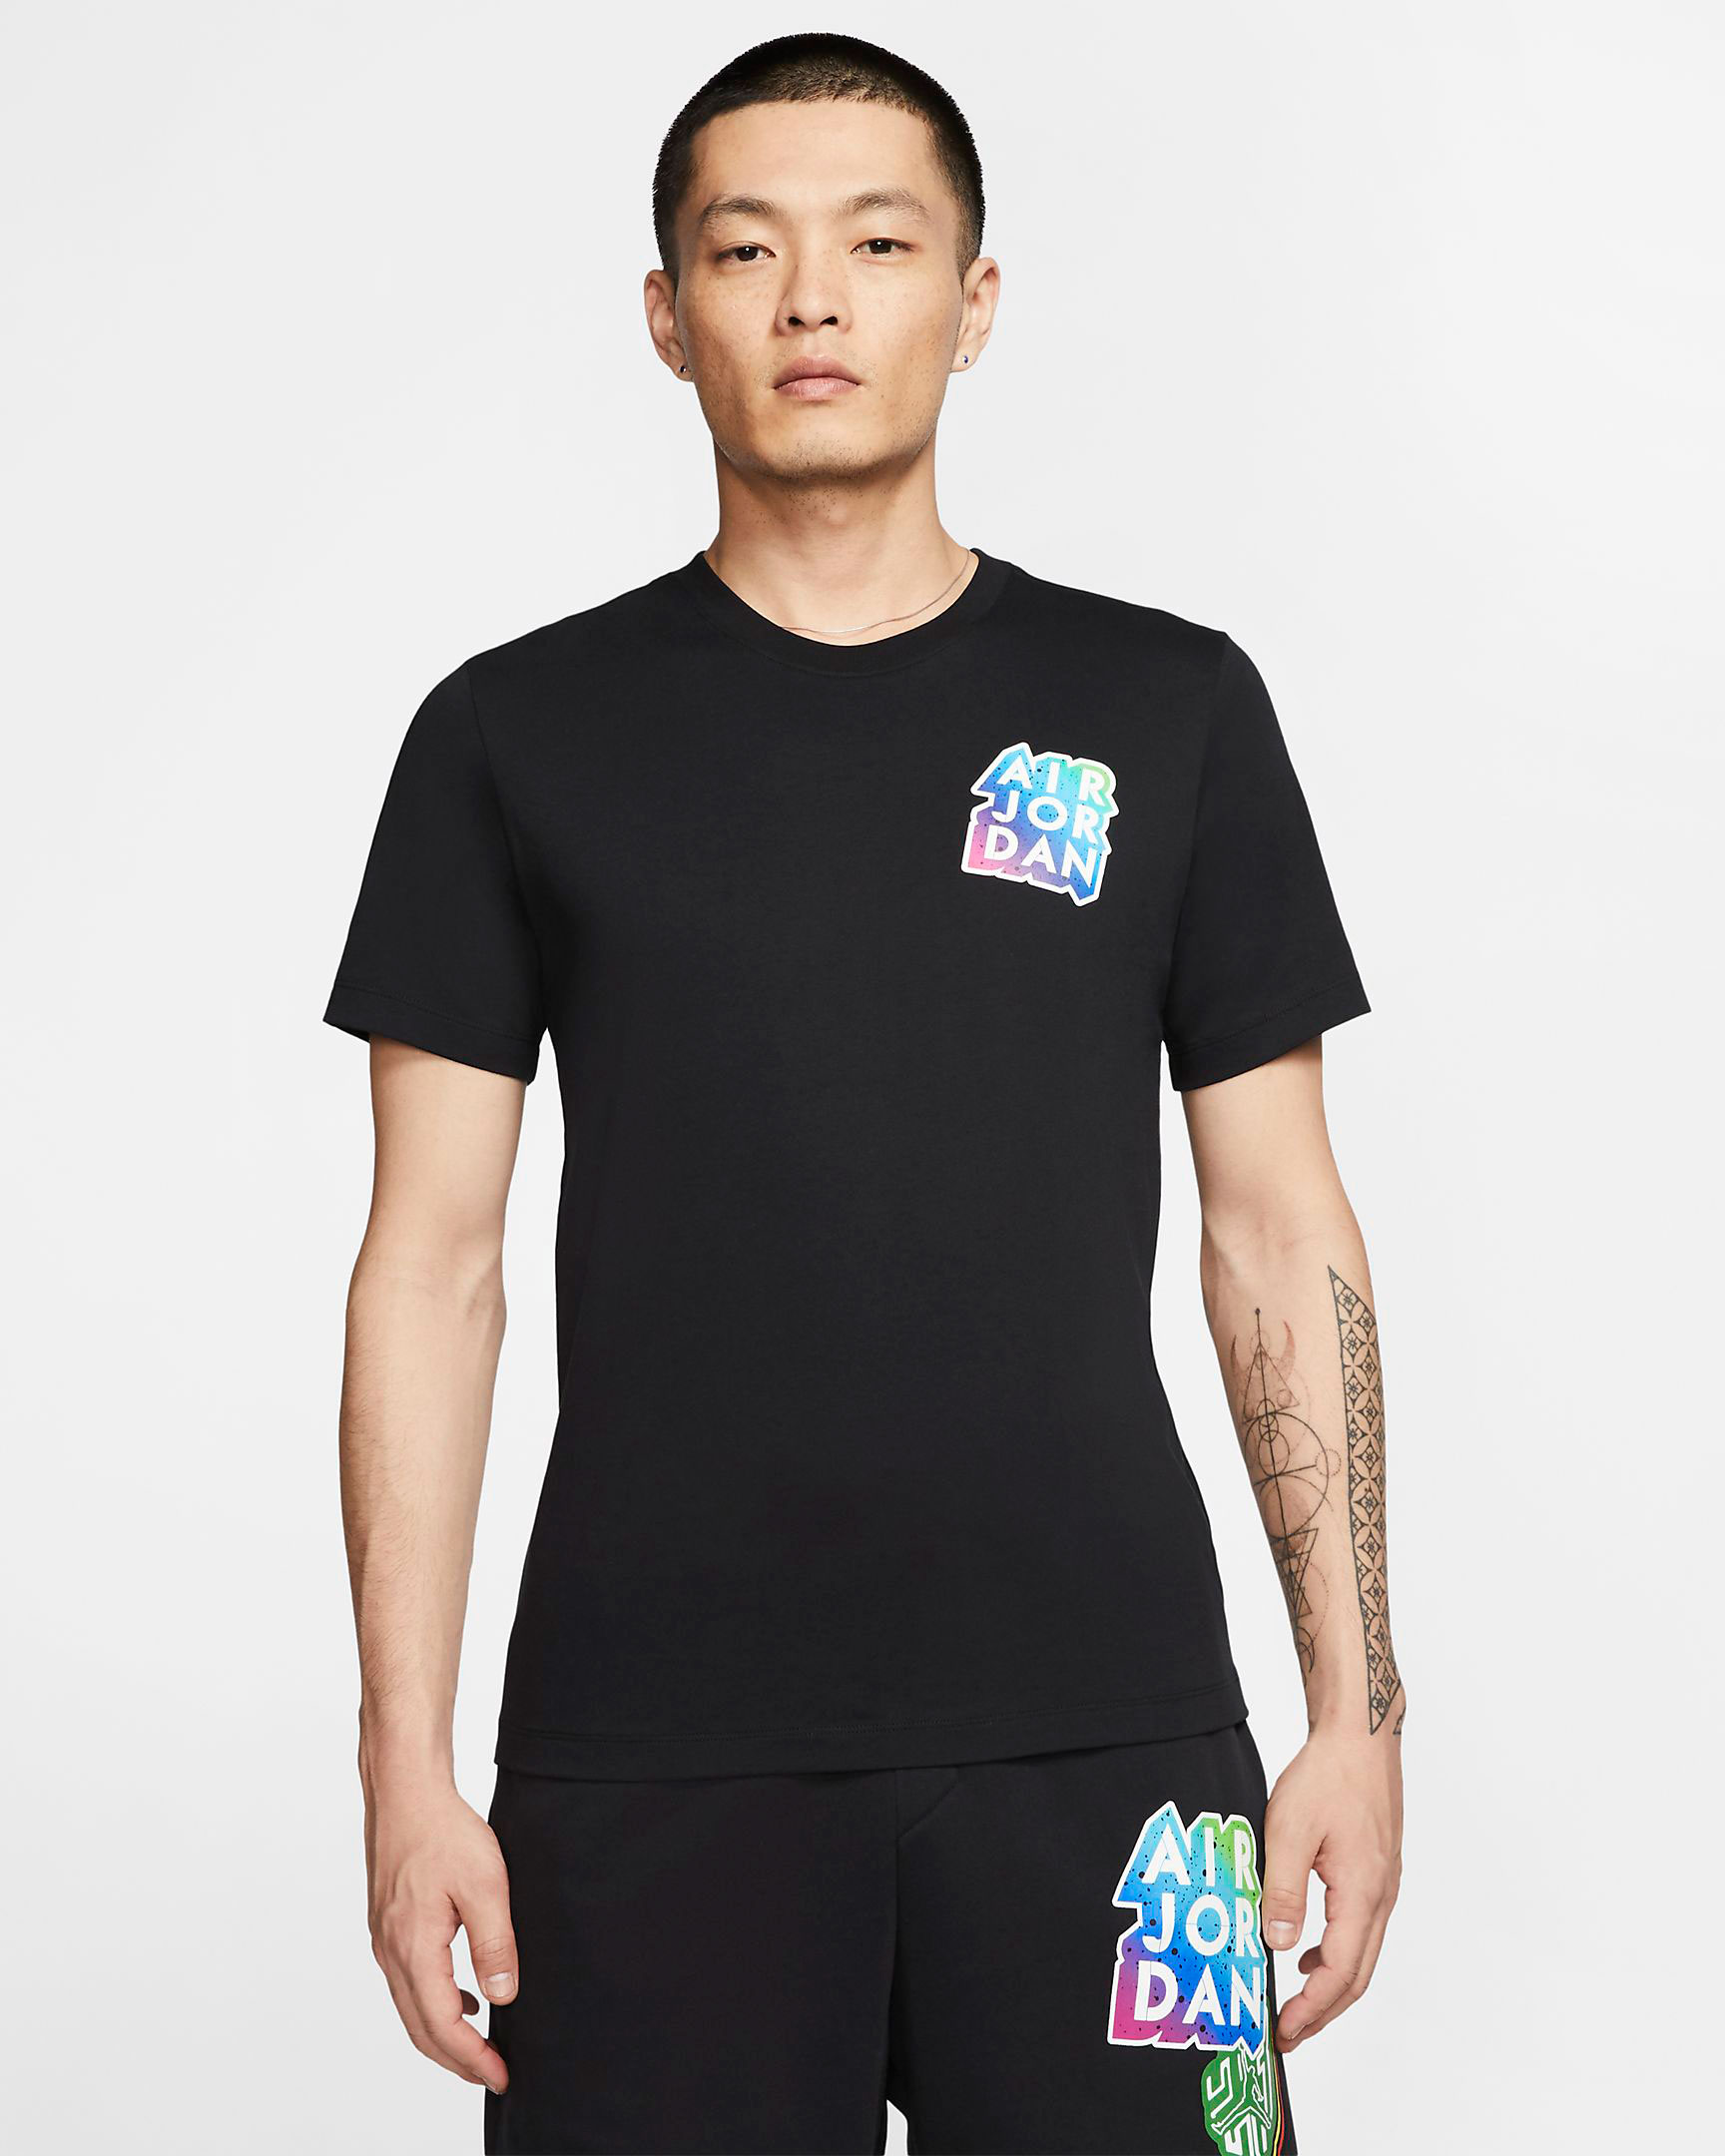 jordan-5-alternate-bel-air-matching-shirt-1